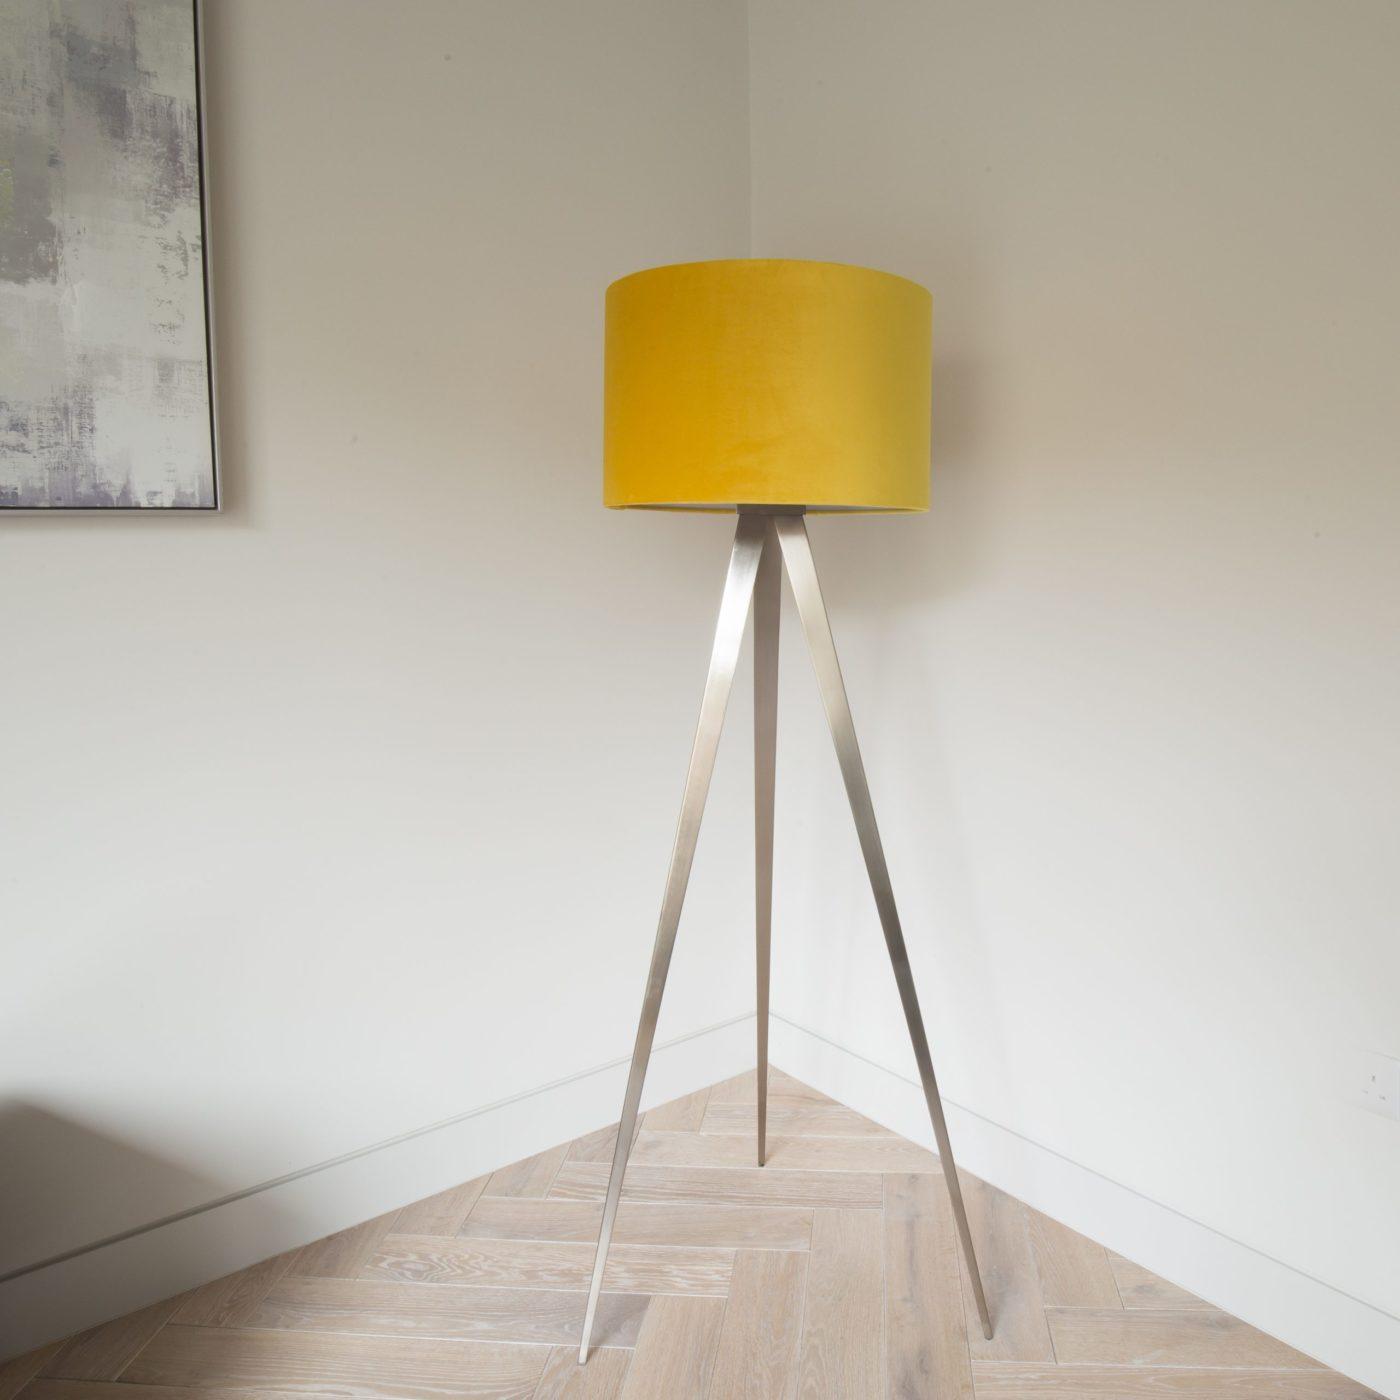 Mustard Tripod Floor Lamp with Brushed Steel Legs